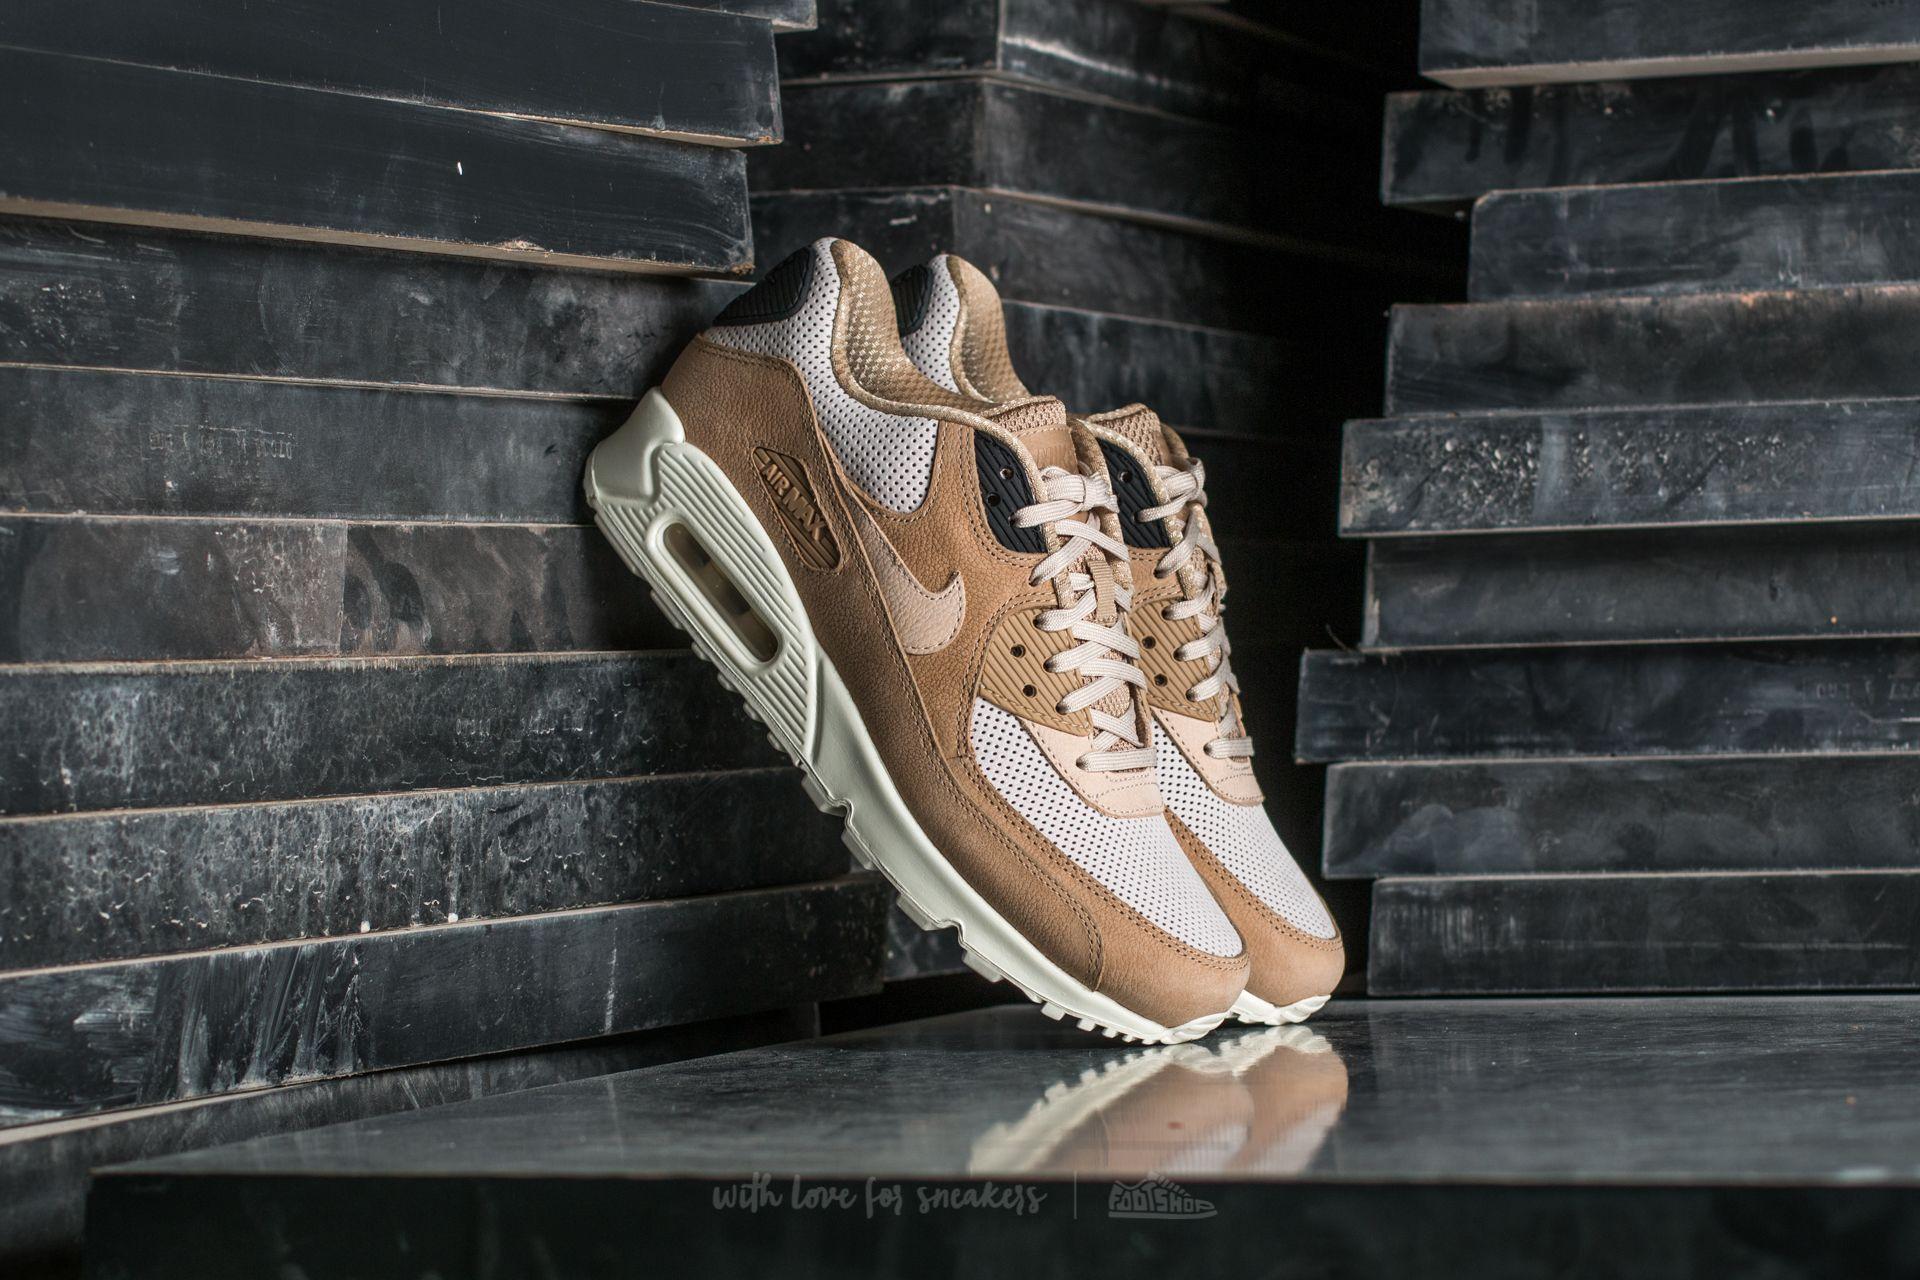 Nike Air Max 90 Pinnacle Leather Sneakers in Light Bone